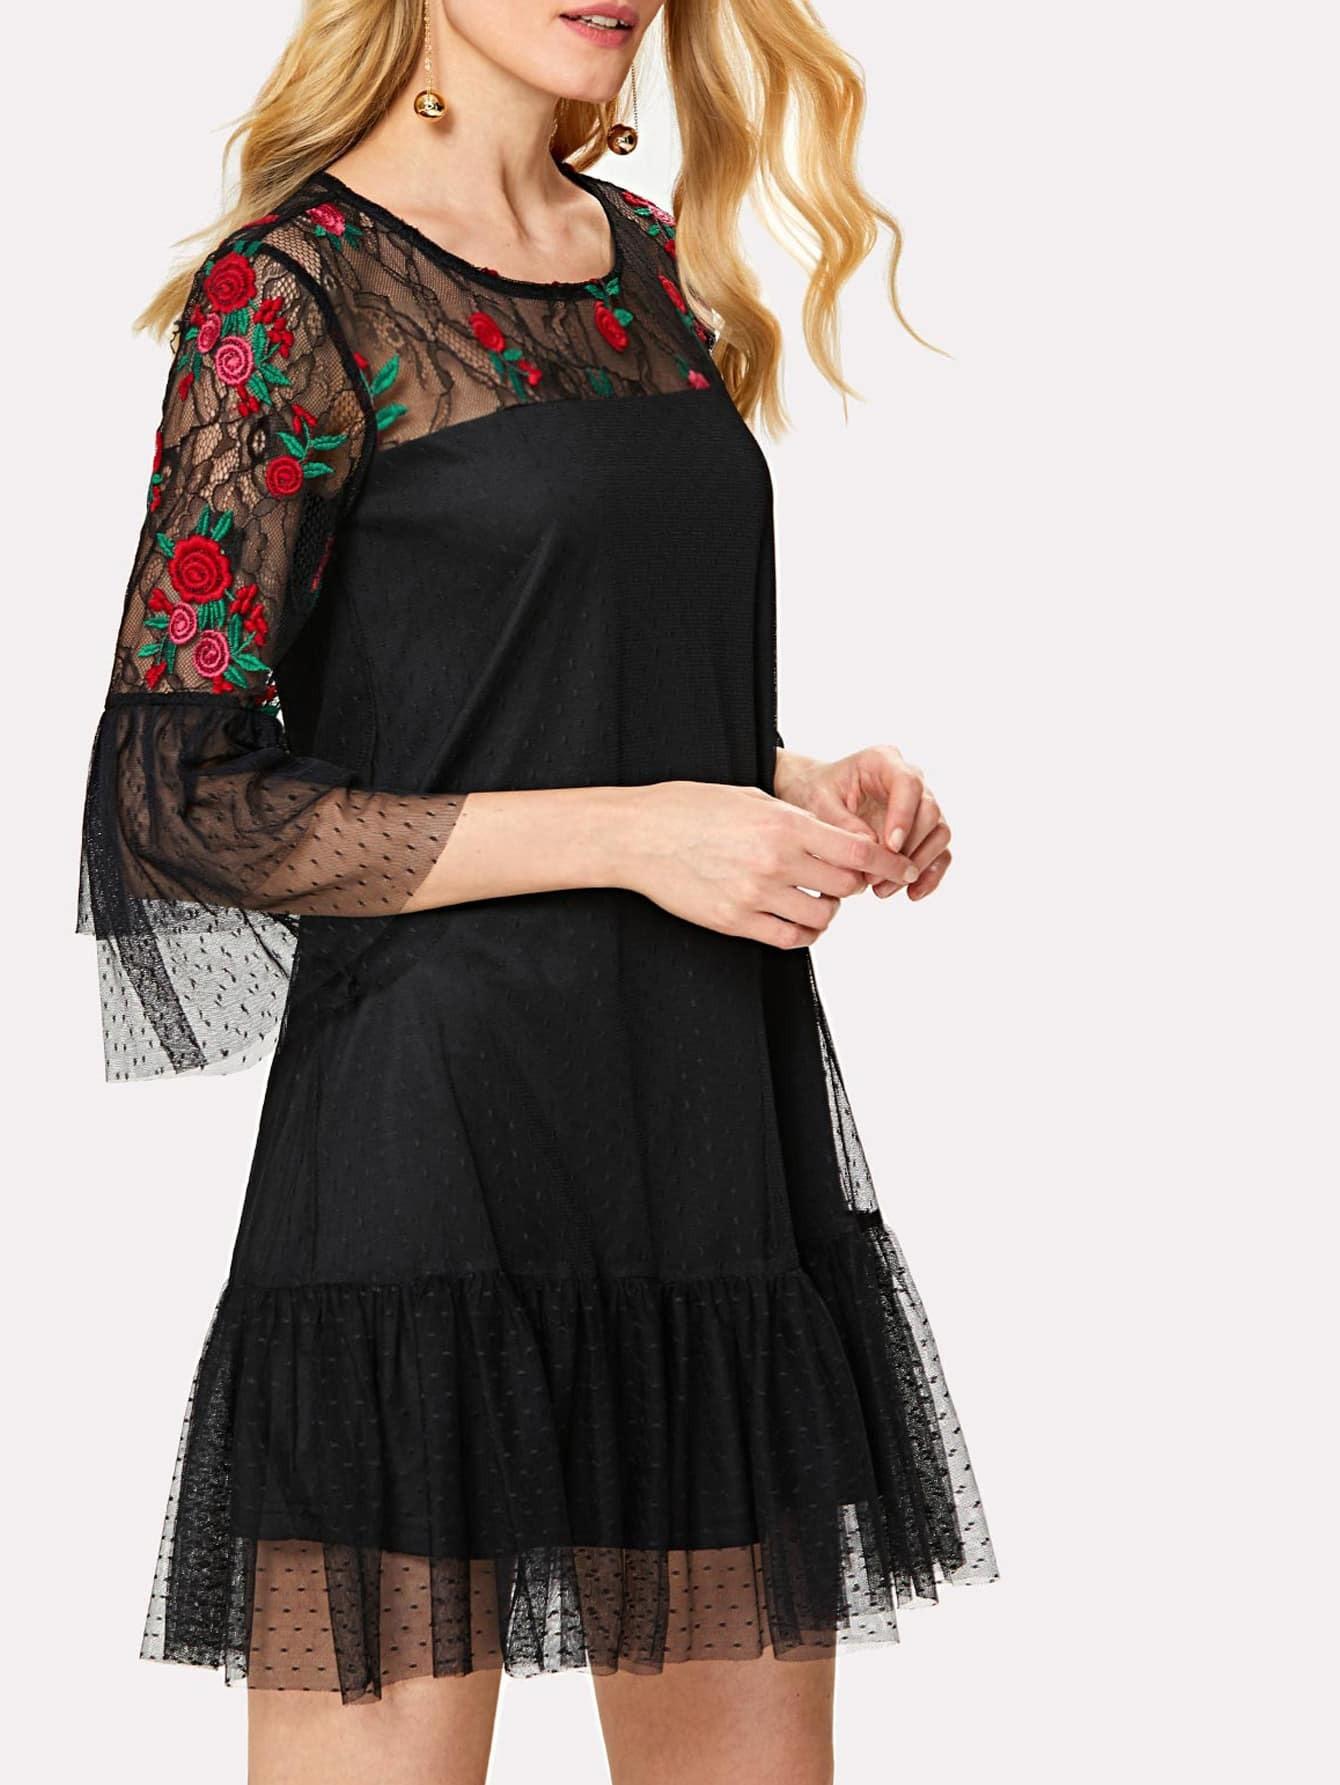 Floral Embroidered Yoke Ruffle Trim Mesh Overlay Dress ruffle mesh panel dress